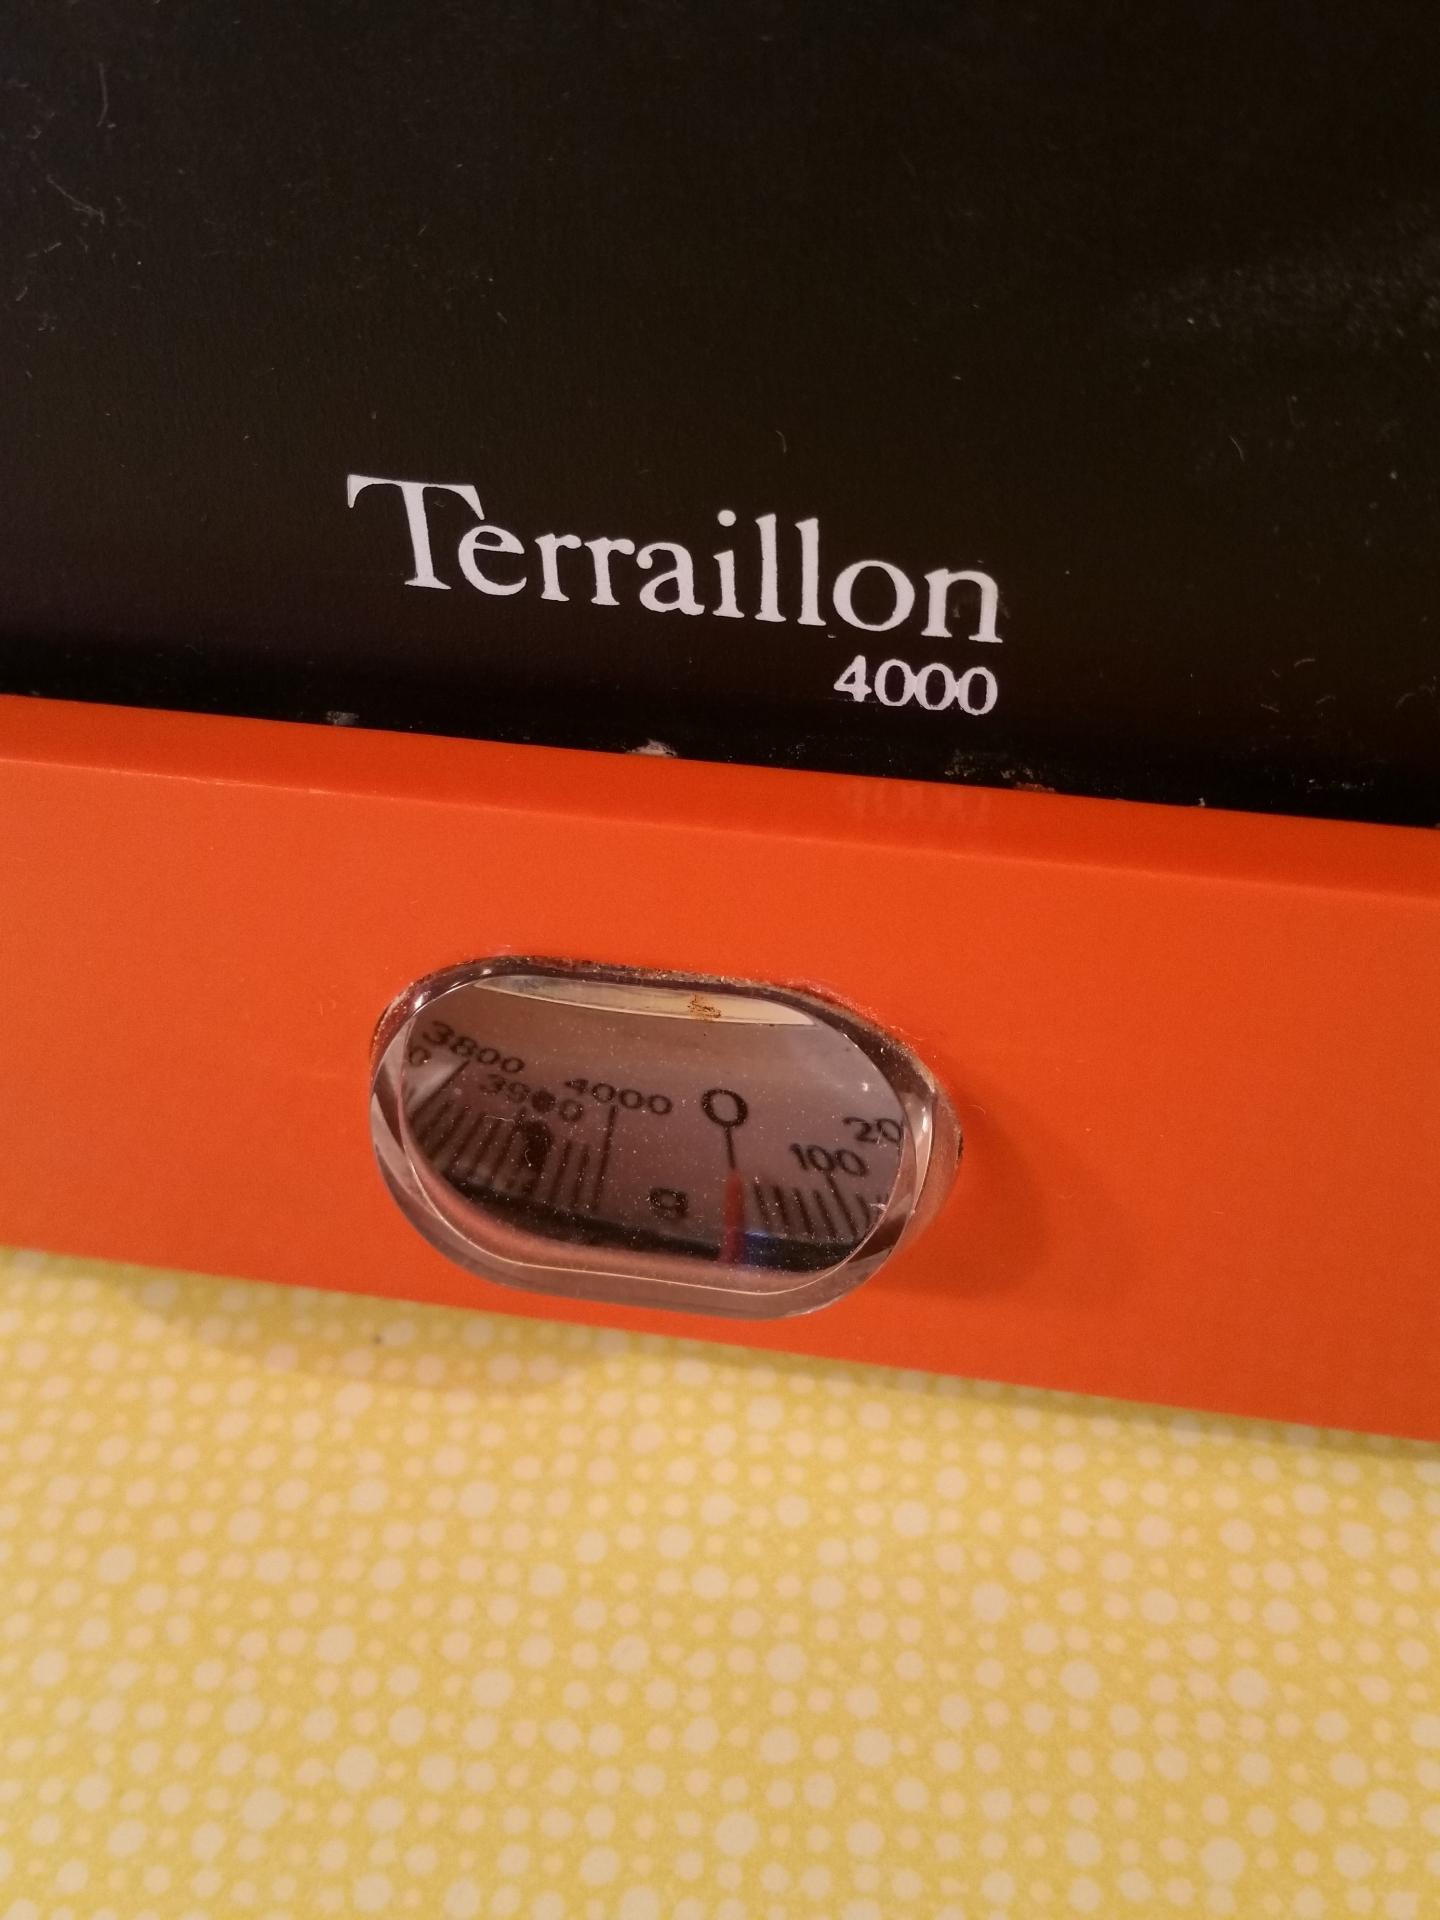 5 terraillon